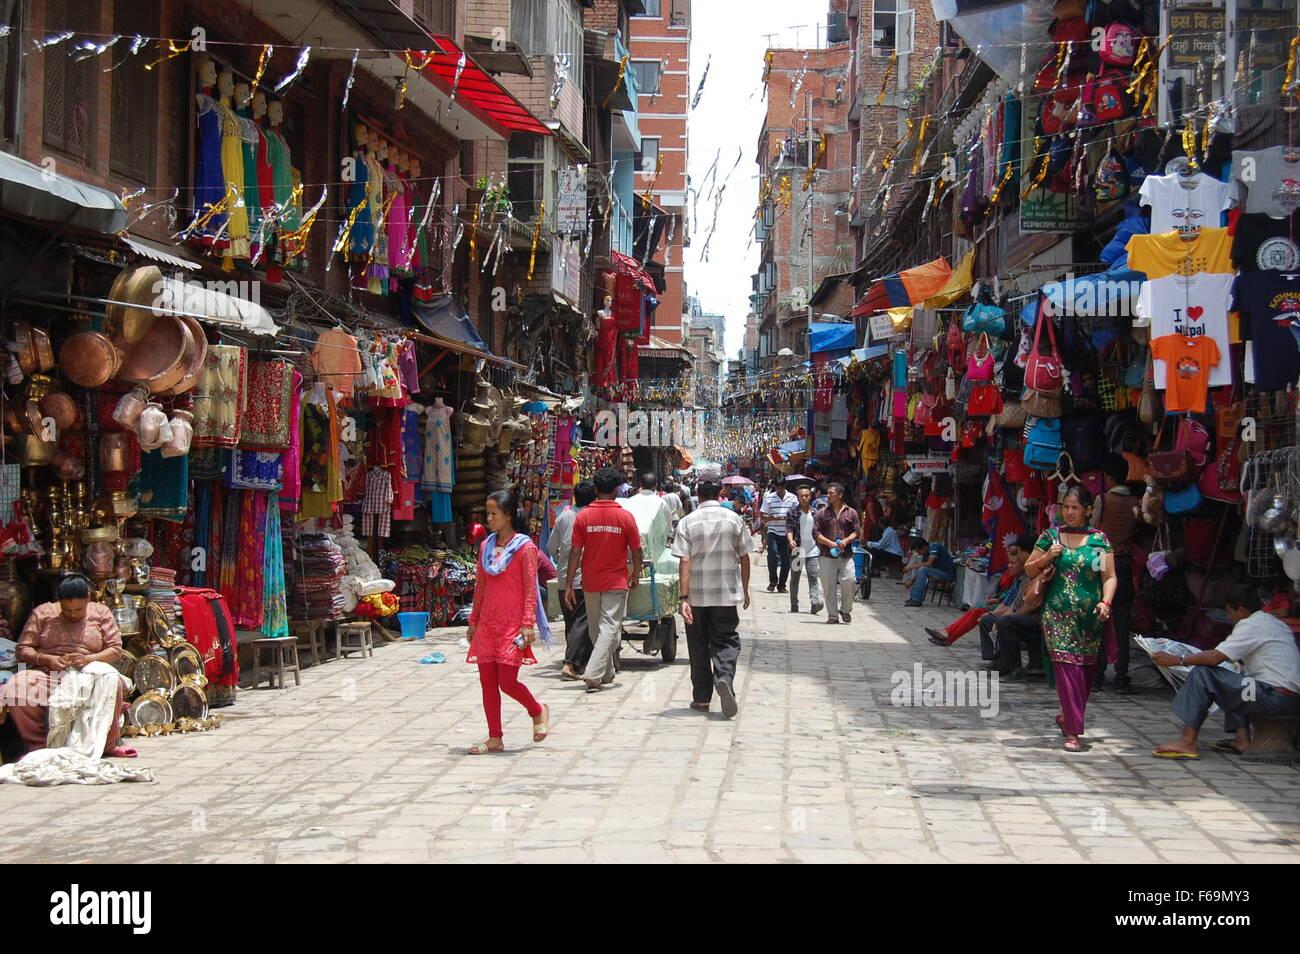 Kathmandu's colorful Streets - Stock Image